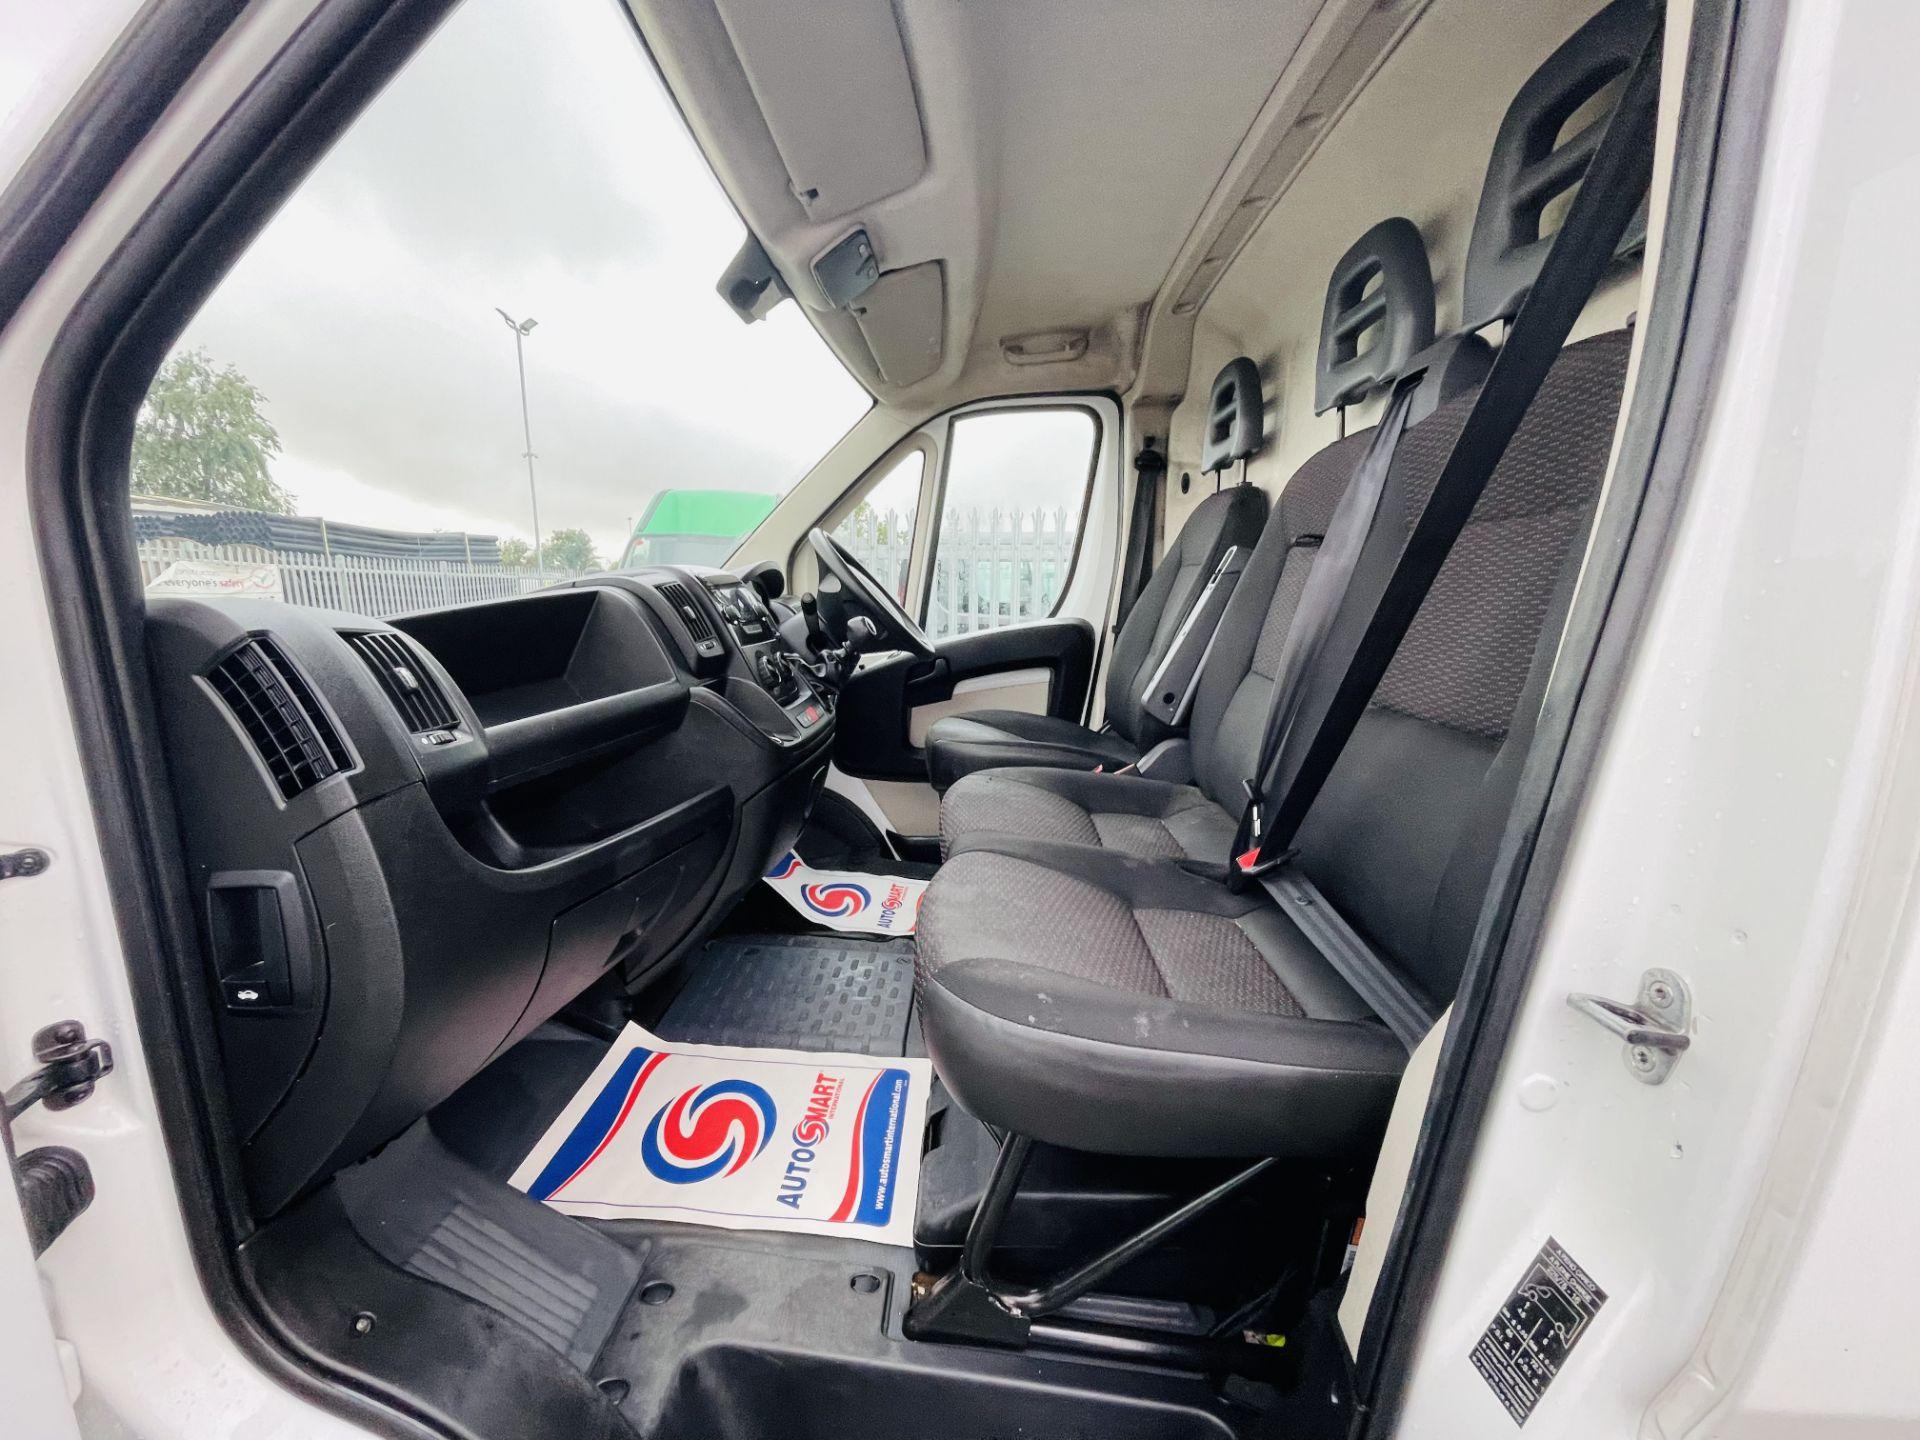 ** ON SALE ** Peugeot Boxer 2.0 BlueHDI L4 H3 2017 '66 Reg' Panel Van - LCV - Euro 6b ULEZ Compliant - Image 7 of 18